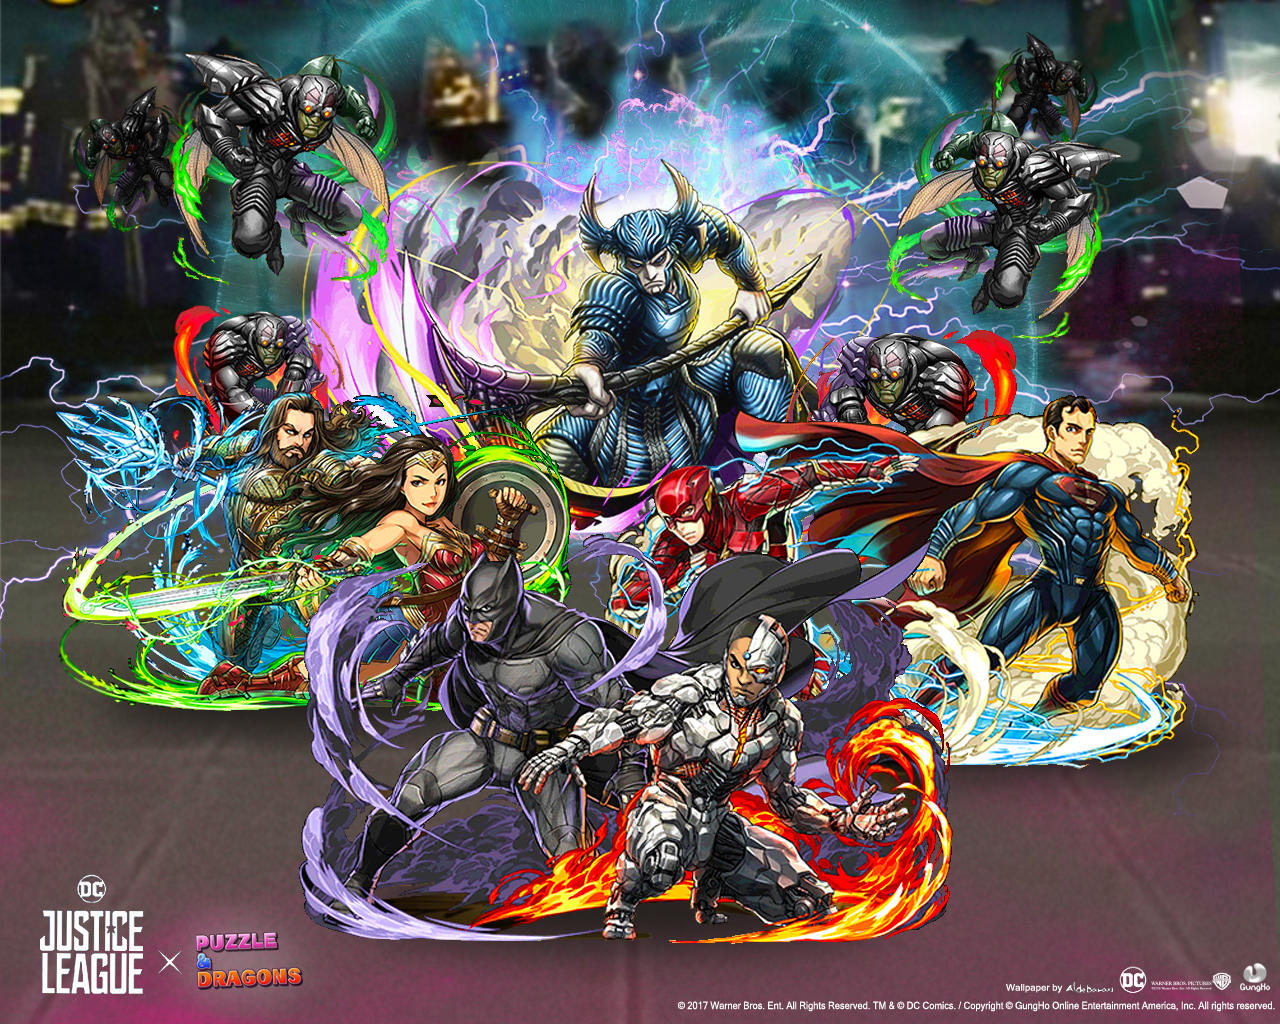 Justice League X Puzzle And Dragons Wallpaper By SaintAldebaran